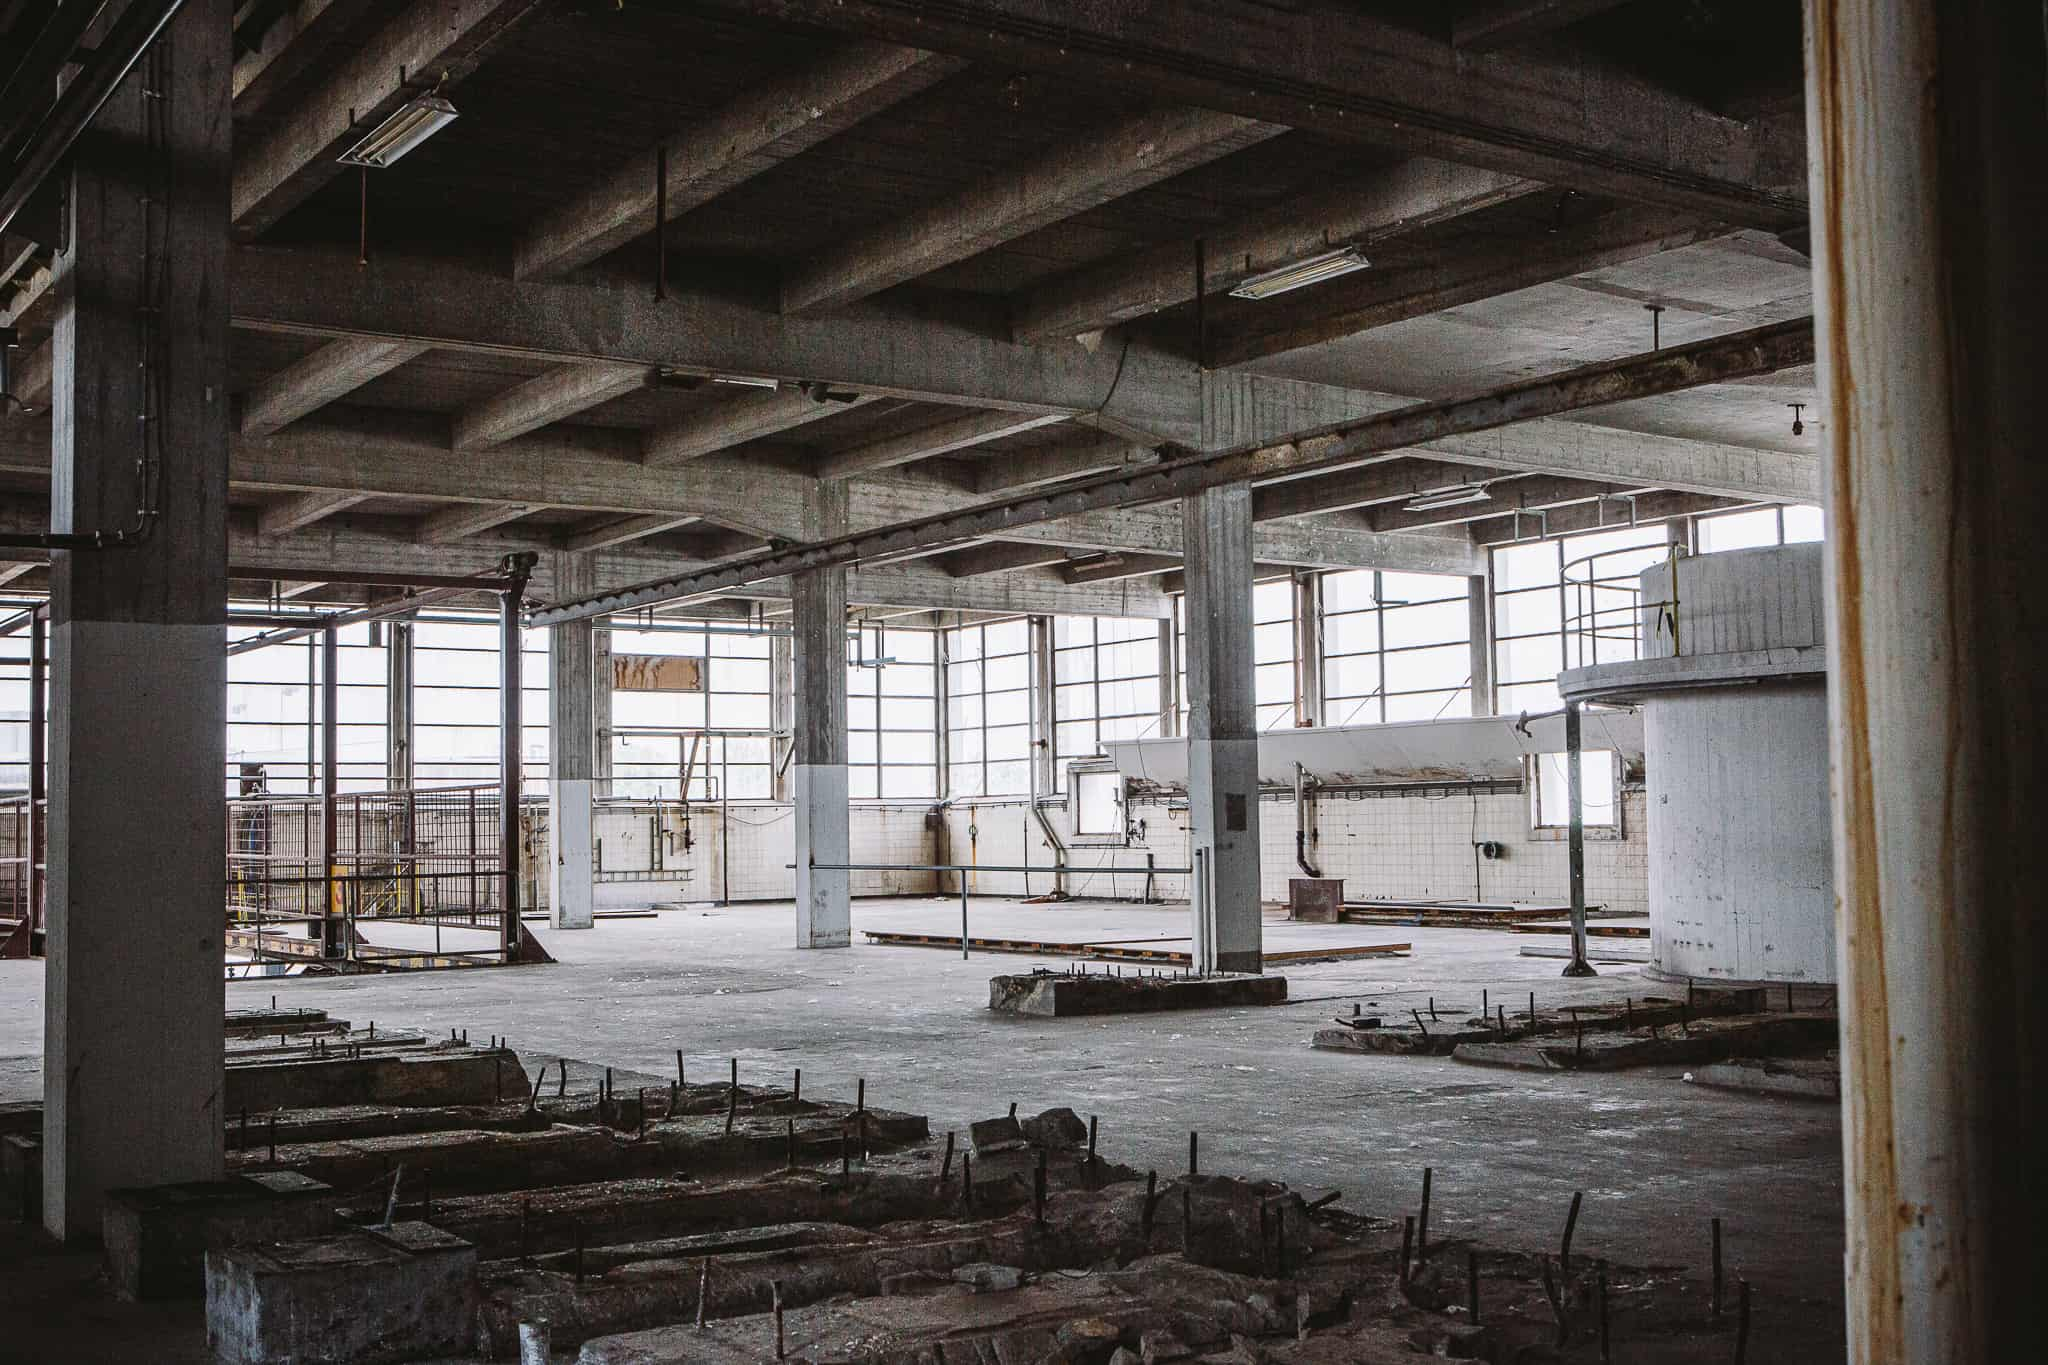 EKI_Nijmegen_06 - papierfabriek - industreel - locatie